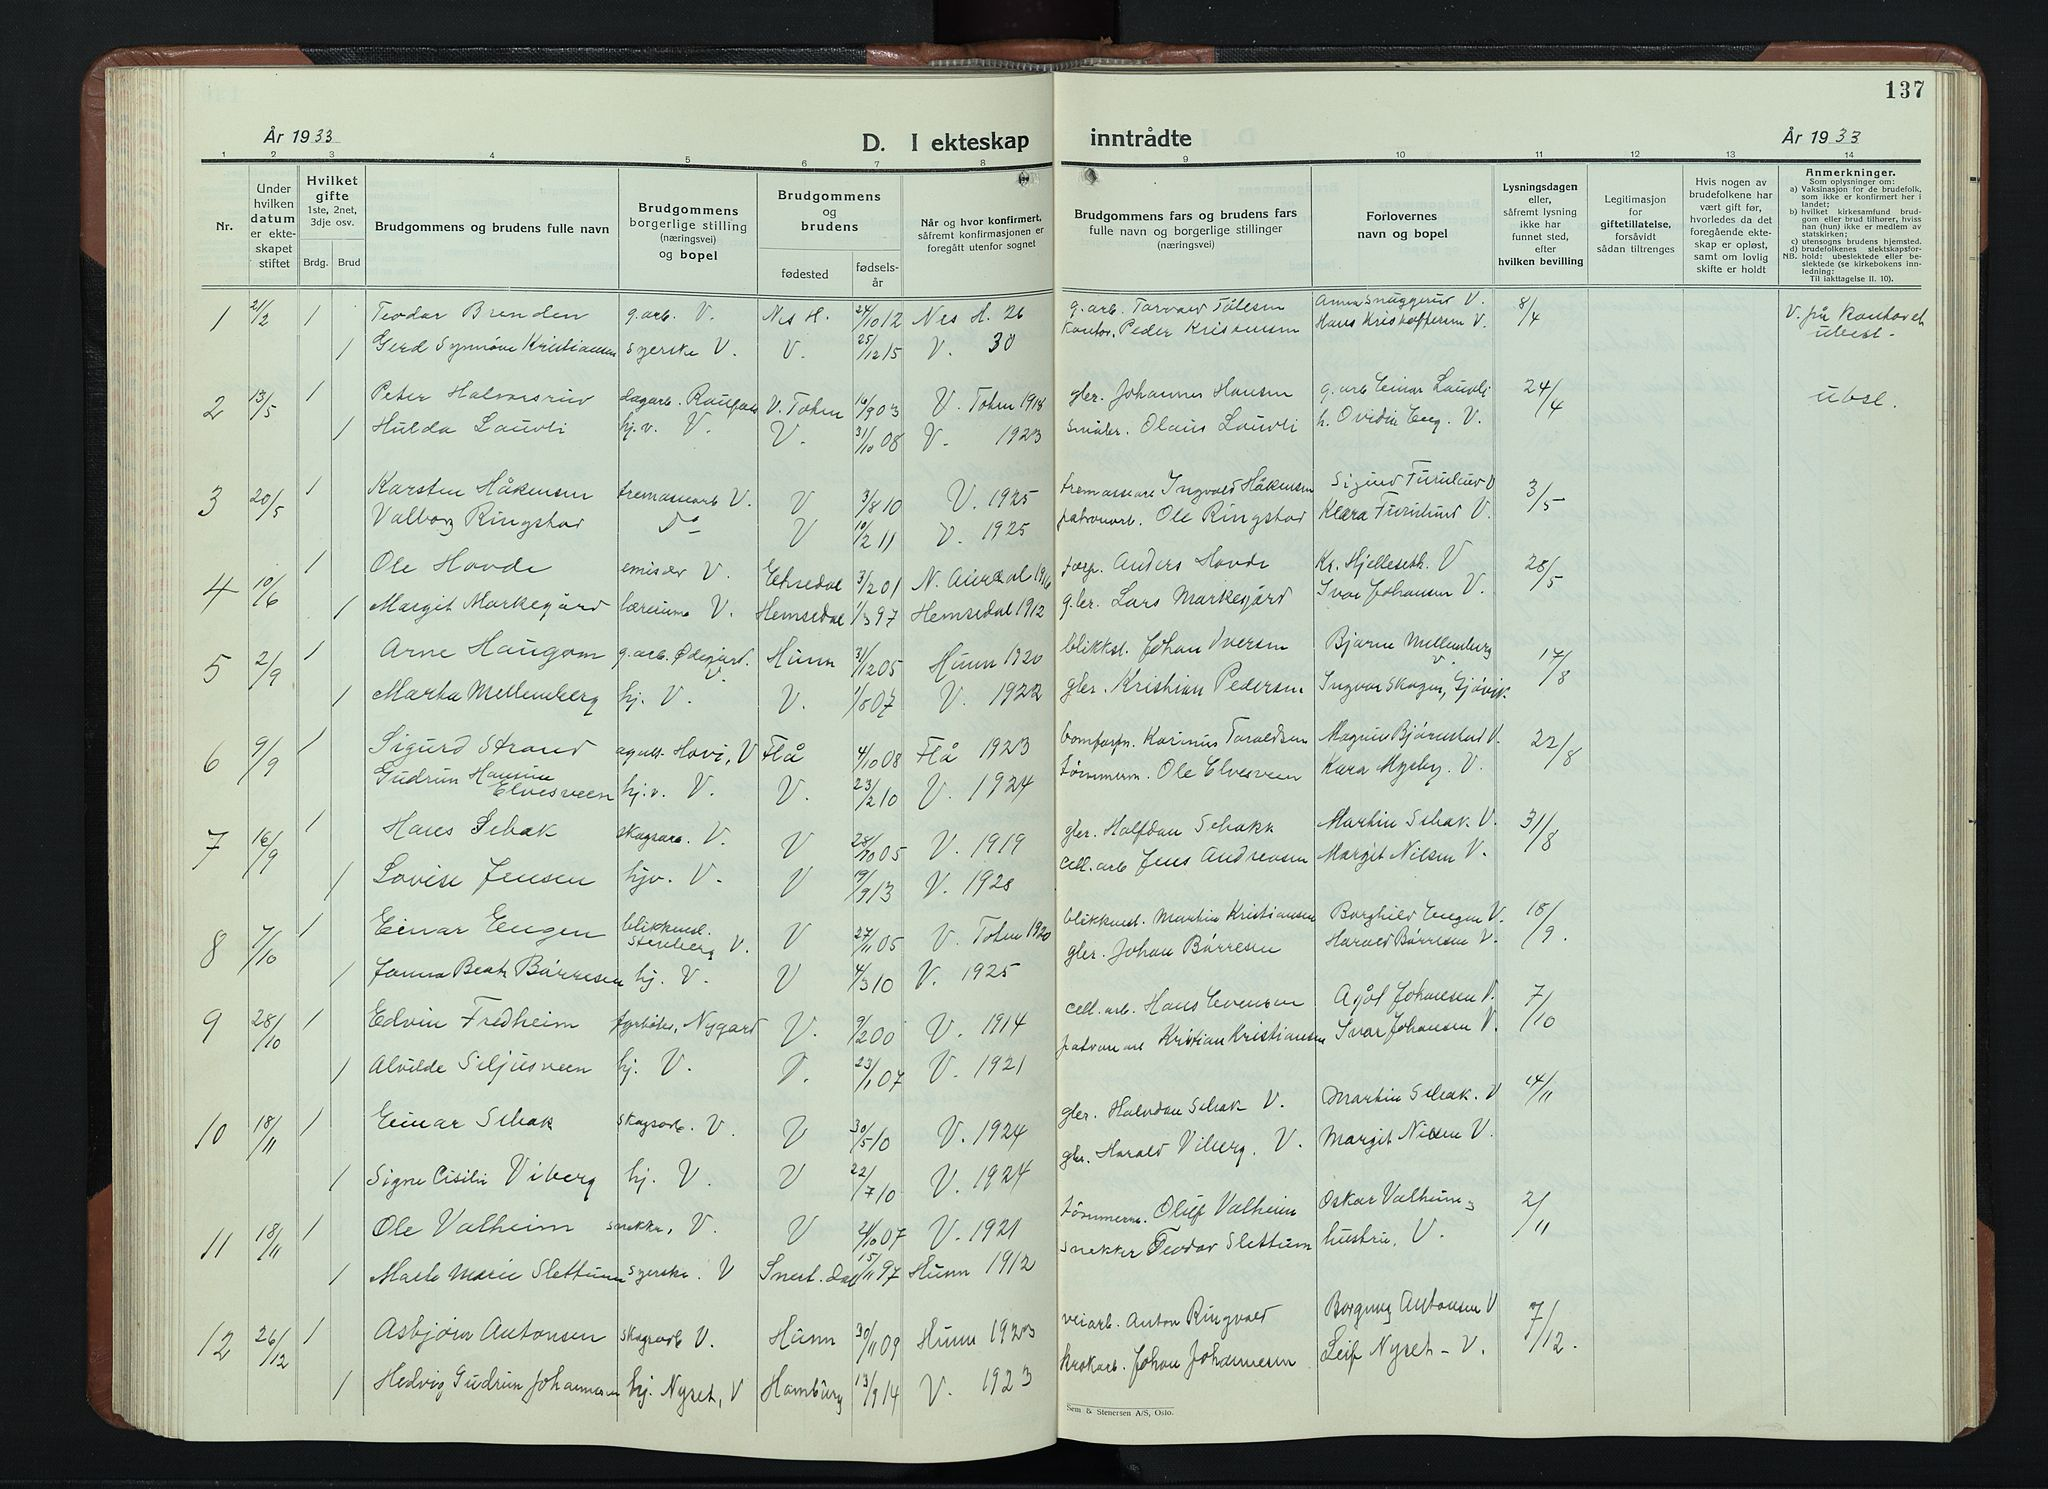 SAH, Vardal prestekontor, H/Ha/Hab/L0018: Klokkerbok nr. 18, 1931-1951, s. 137